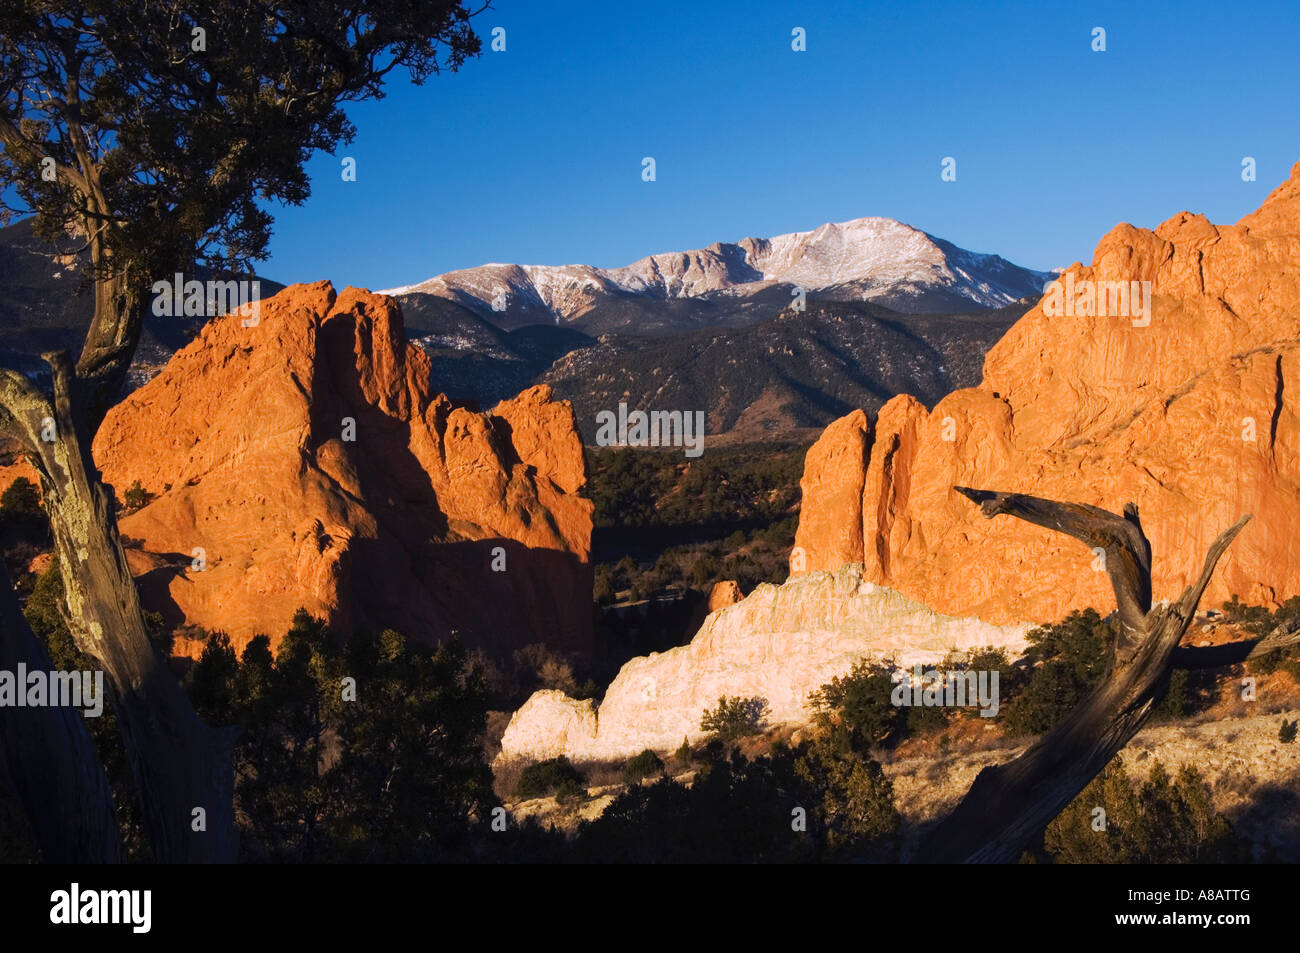 Moderno Enmarcando Colorado Springs Componente - Ideas ...